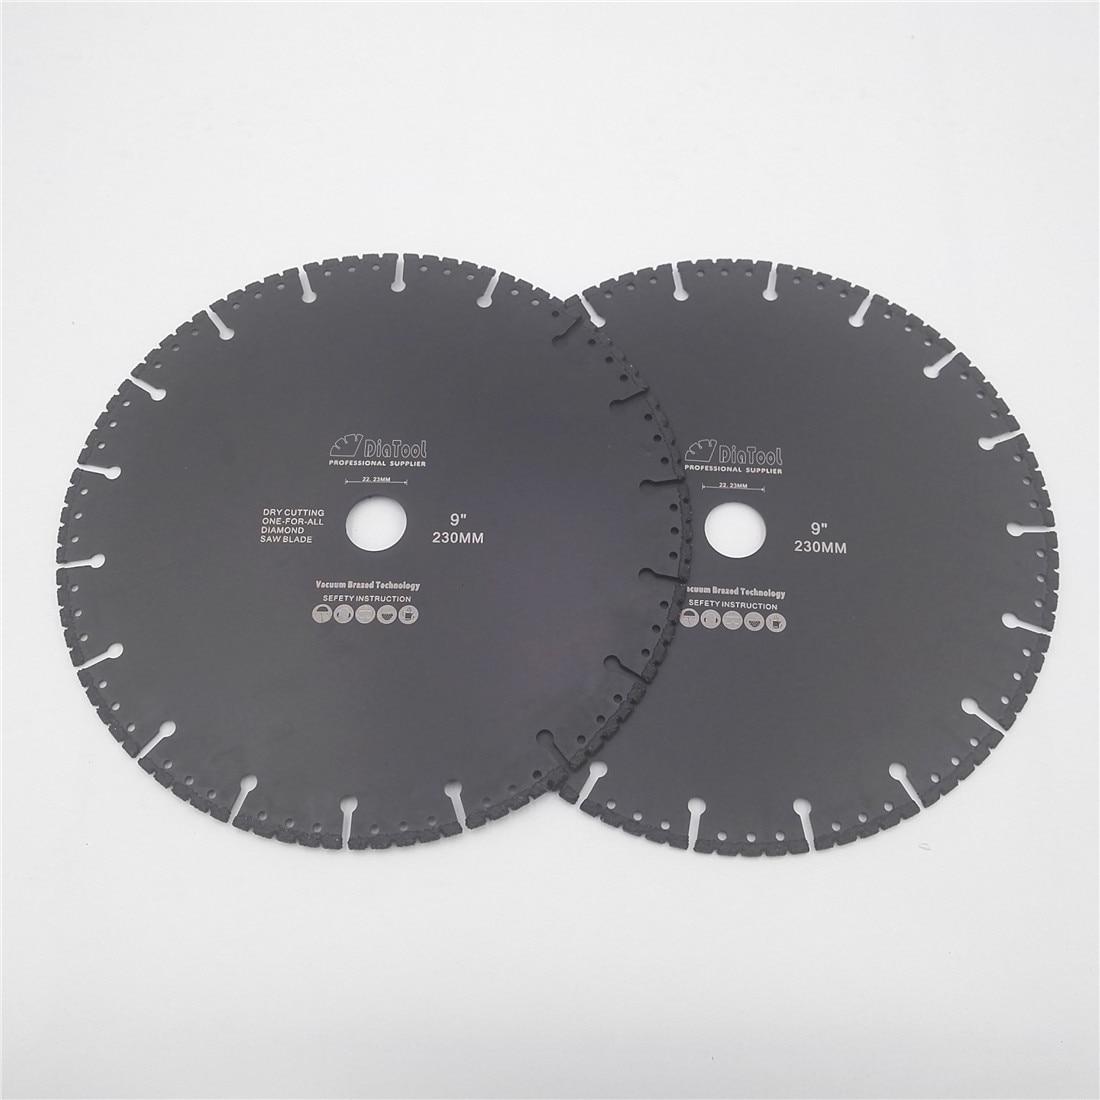 DIATOOL 2pcs 230mm Vacuum Brazed Diamond Blade multi Purpose 9